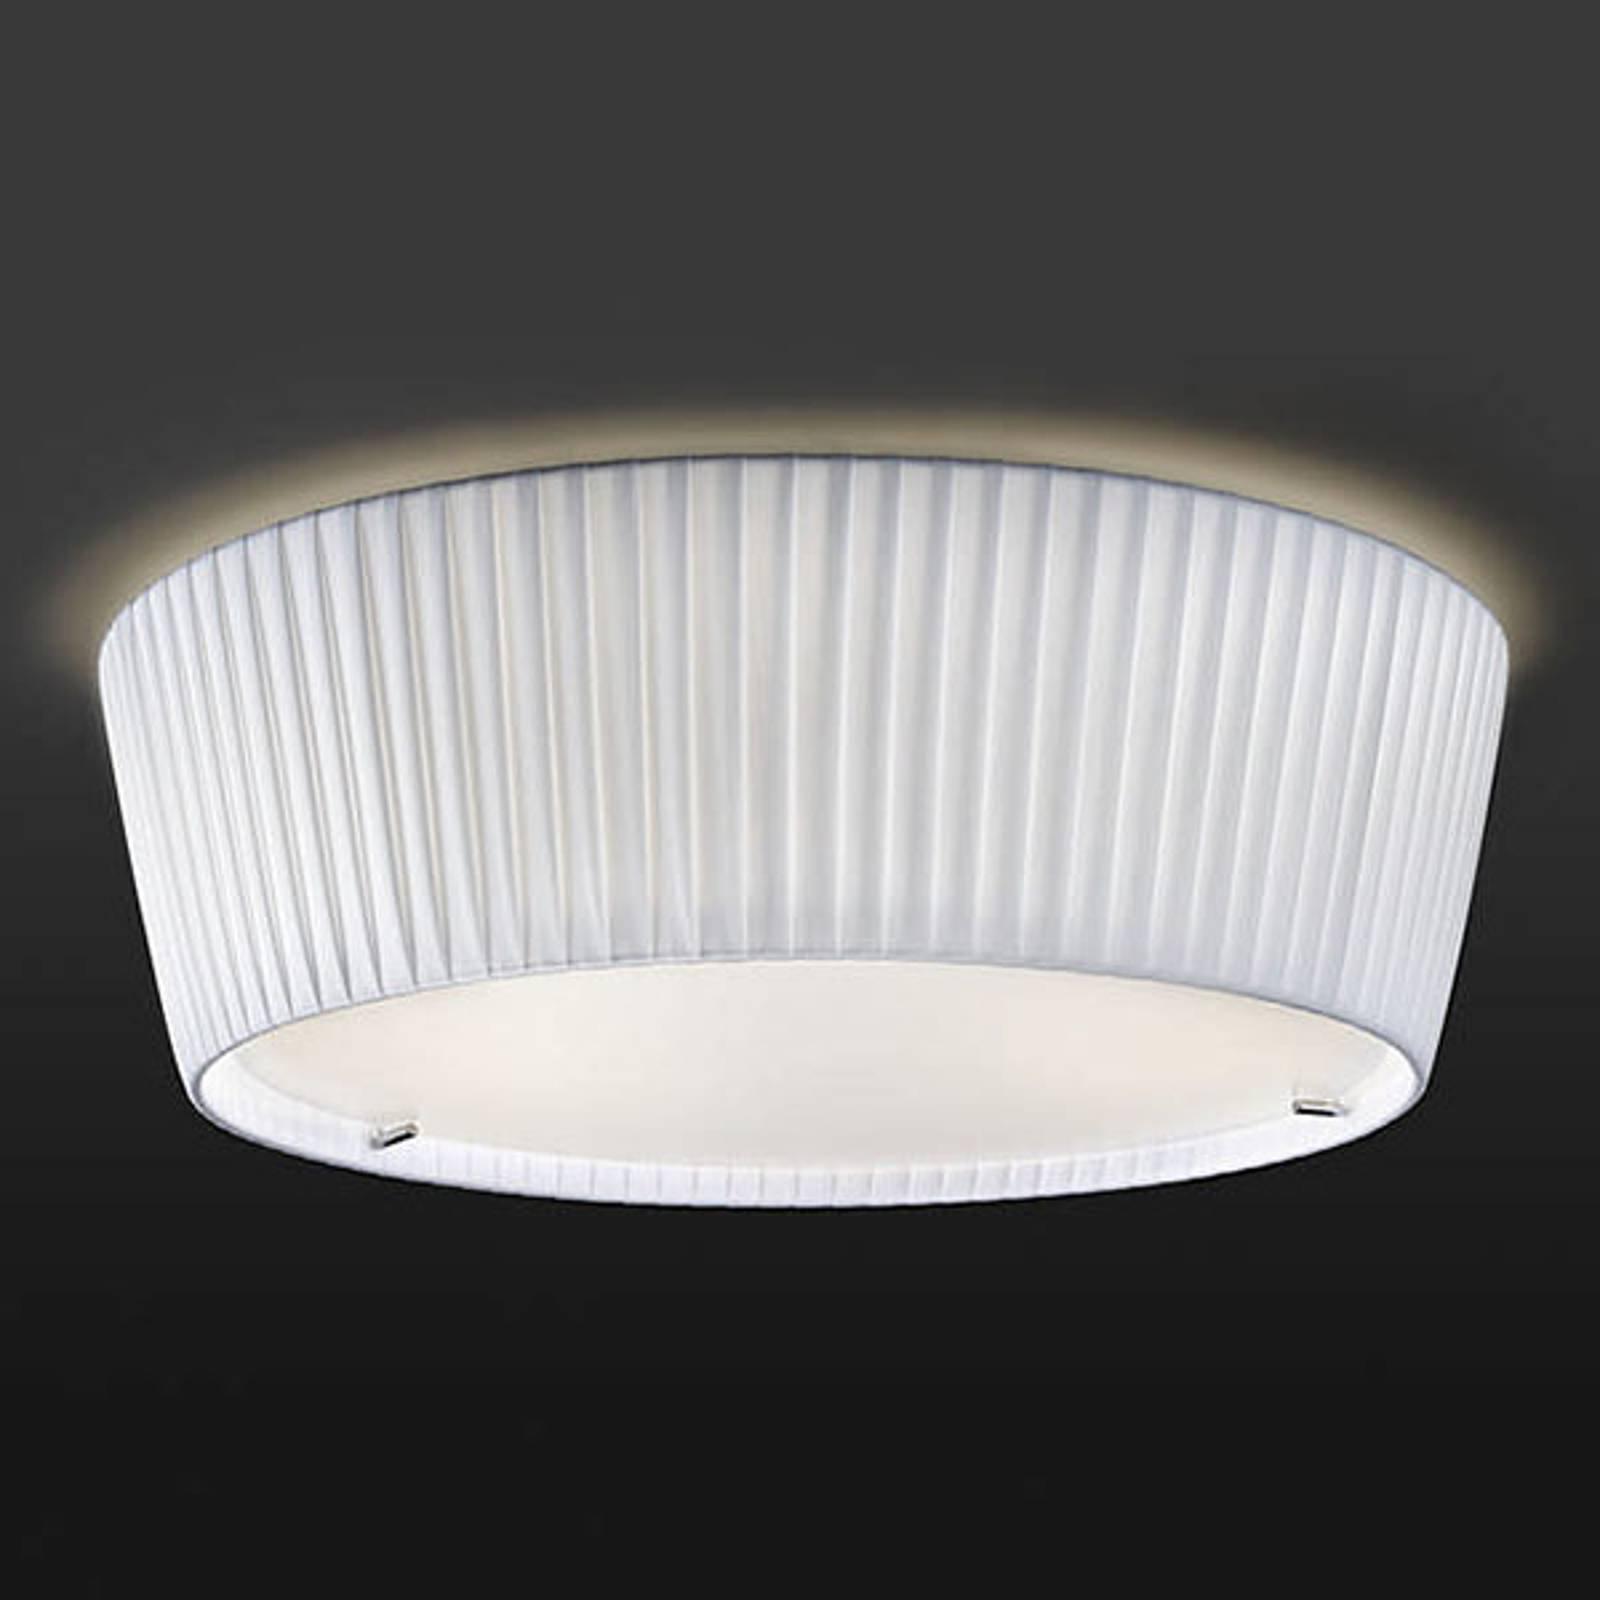 Bover Plafonet 43 - stoff-taklampe, bånd hvit